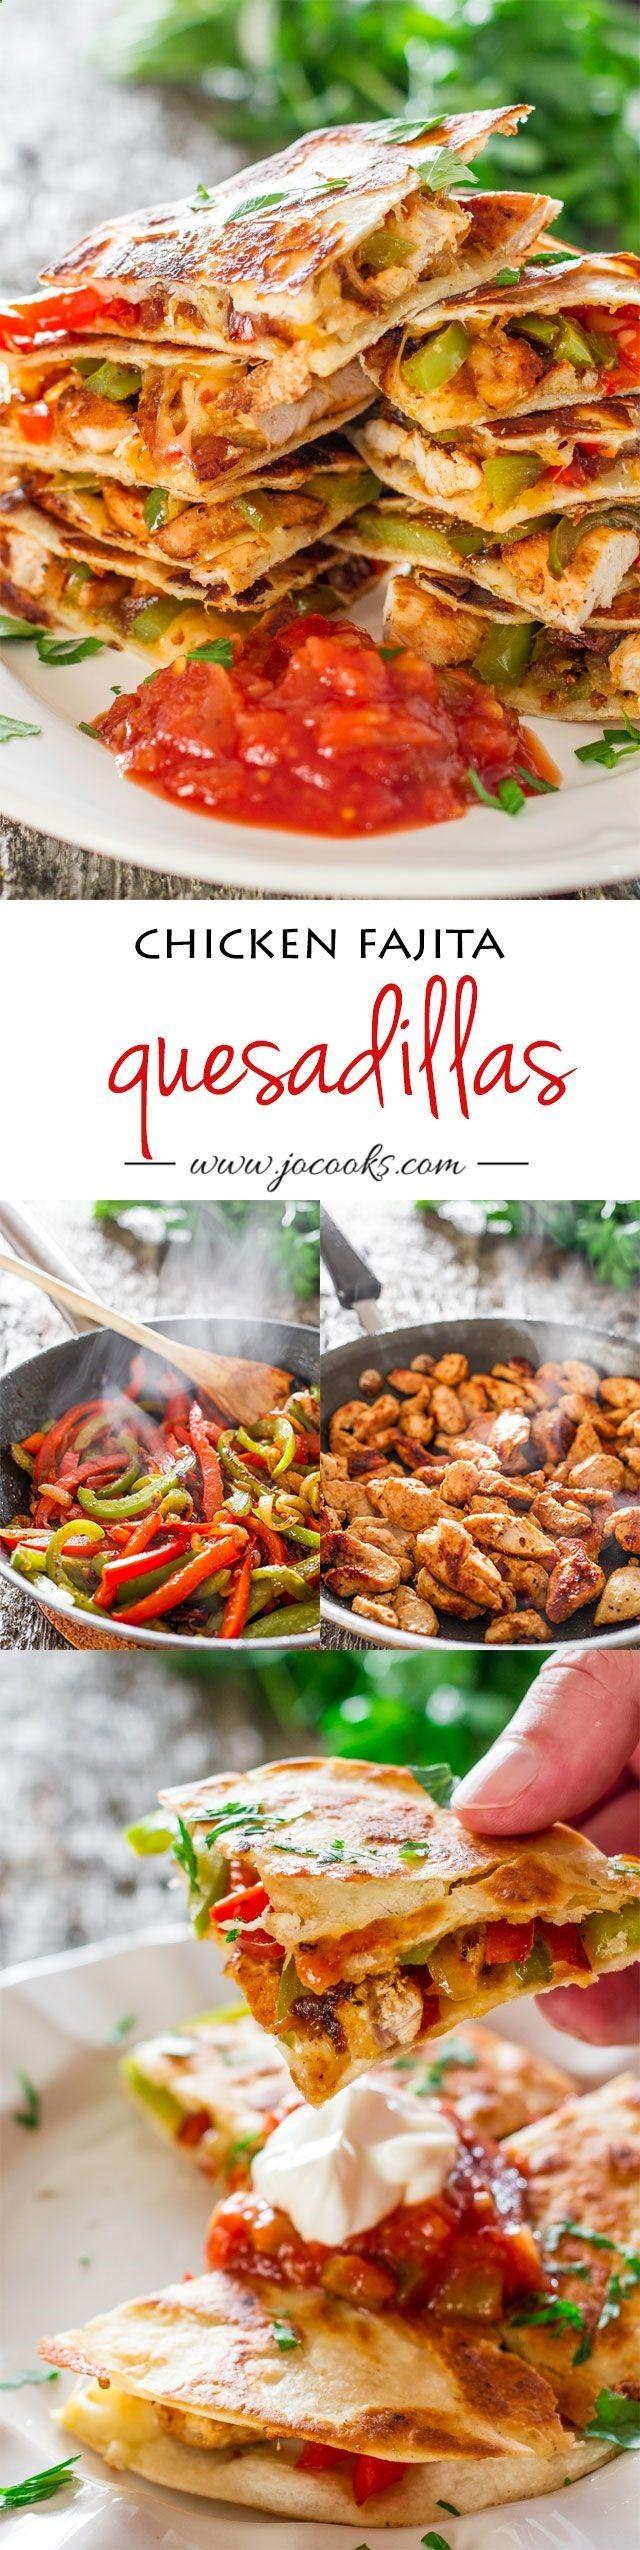 Chicken Fajita Quesadillas #texmex #foodporn #dan330 livedan330.com/...